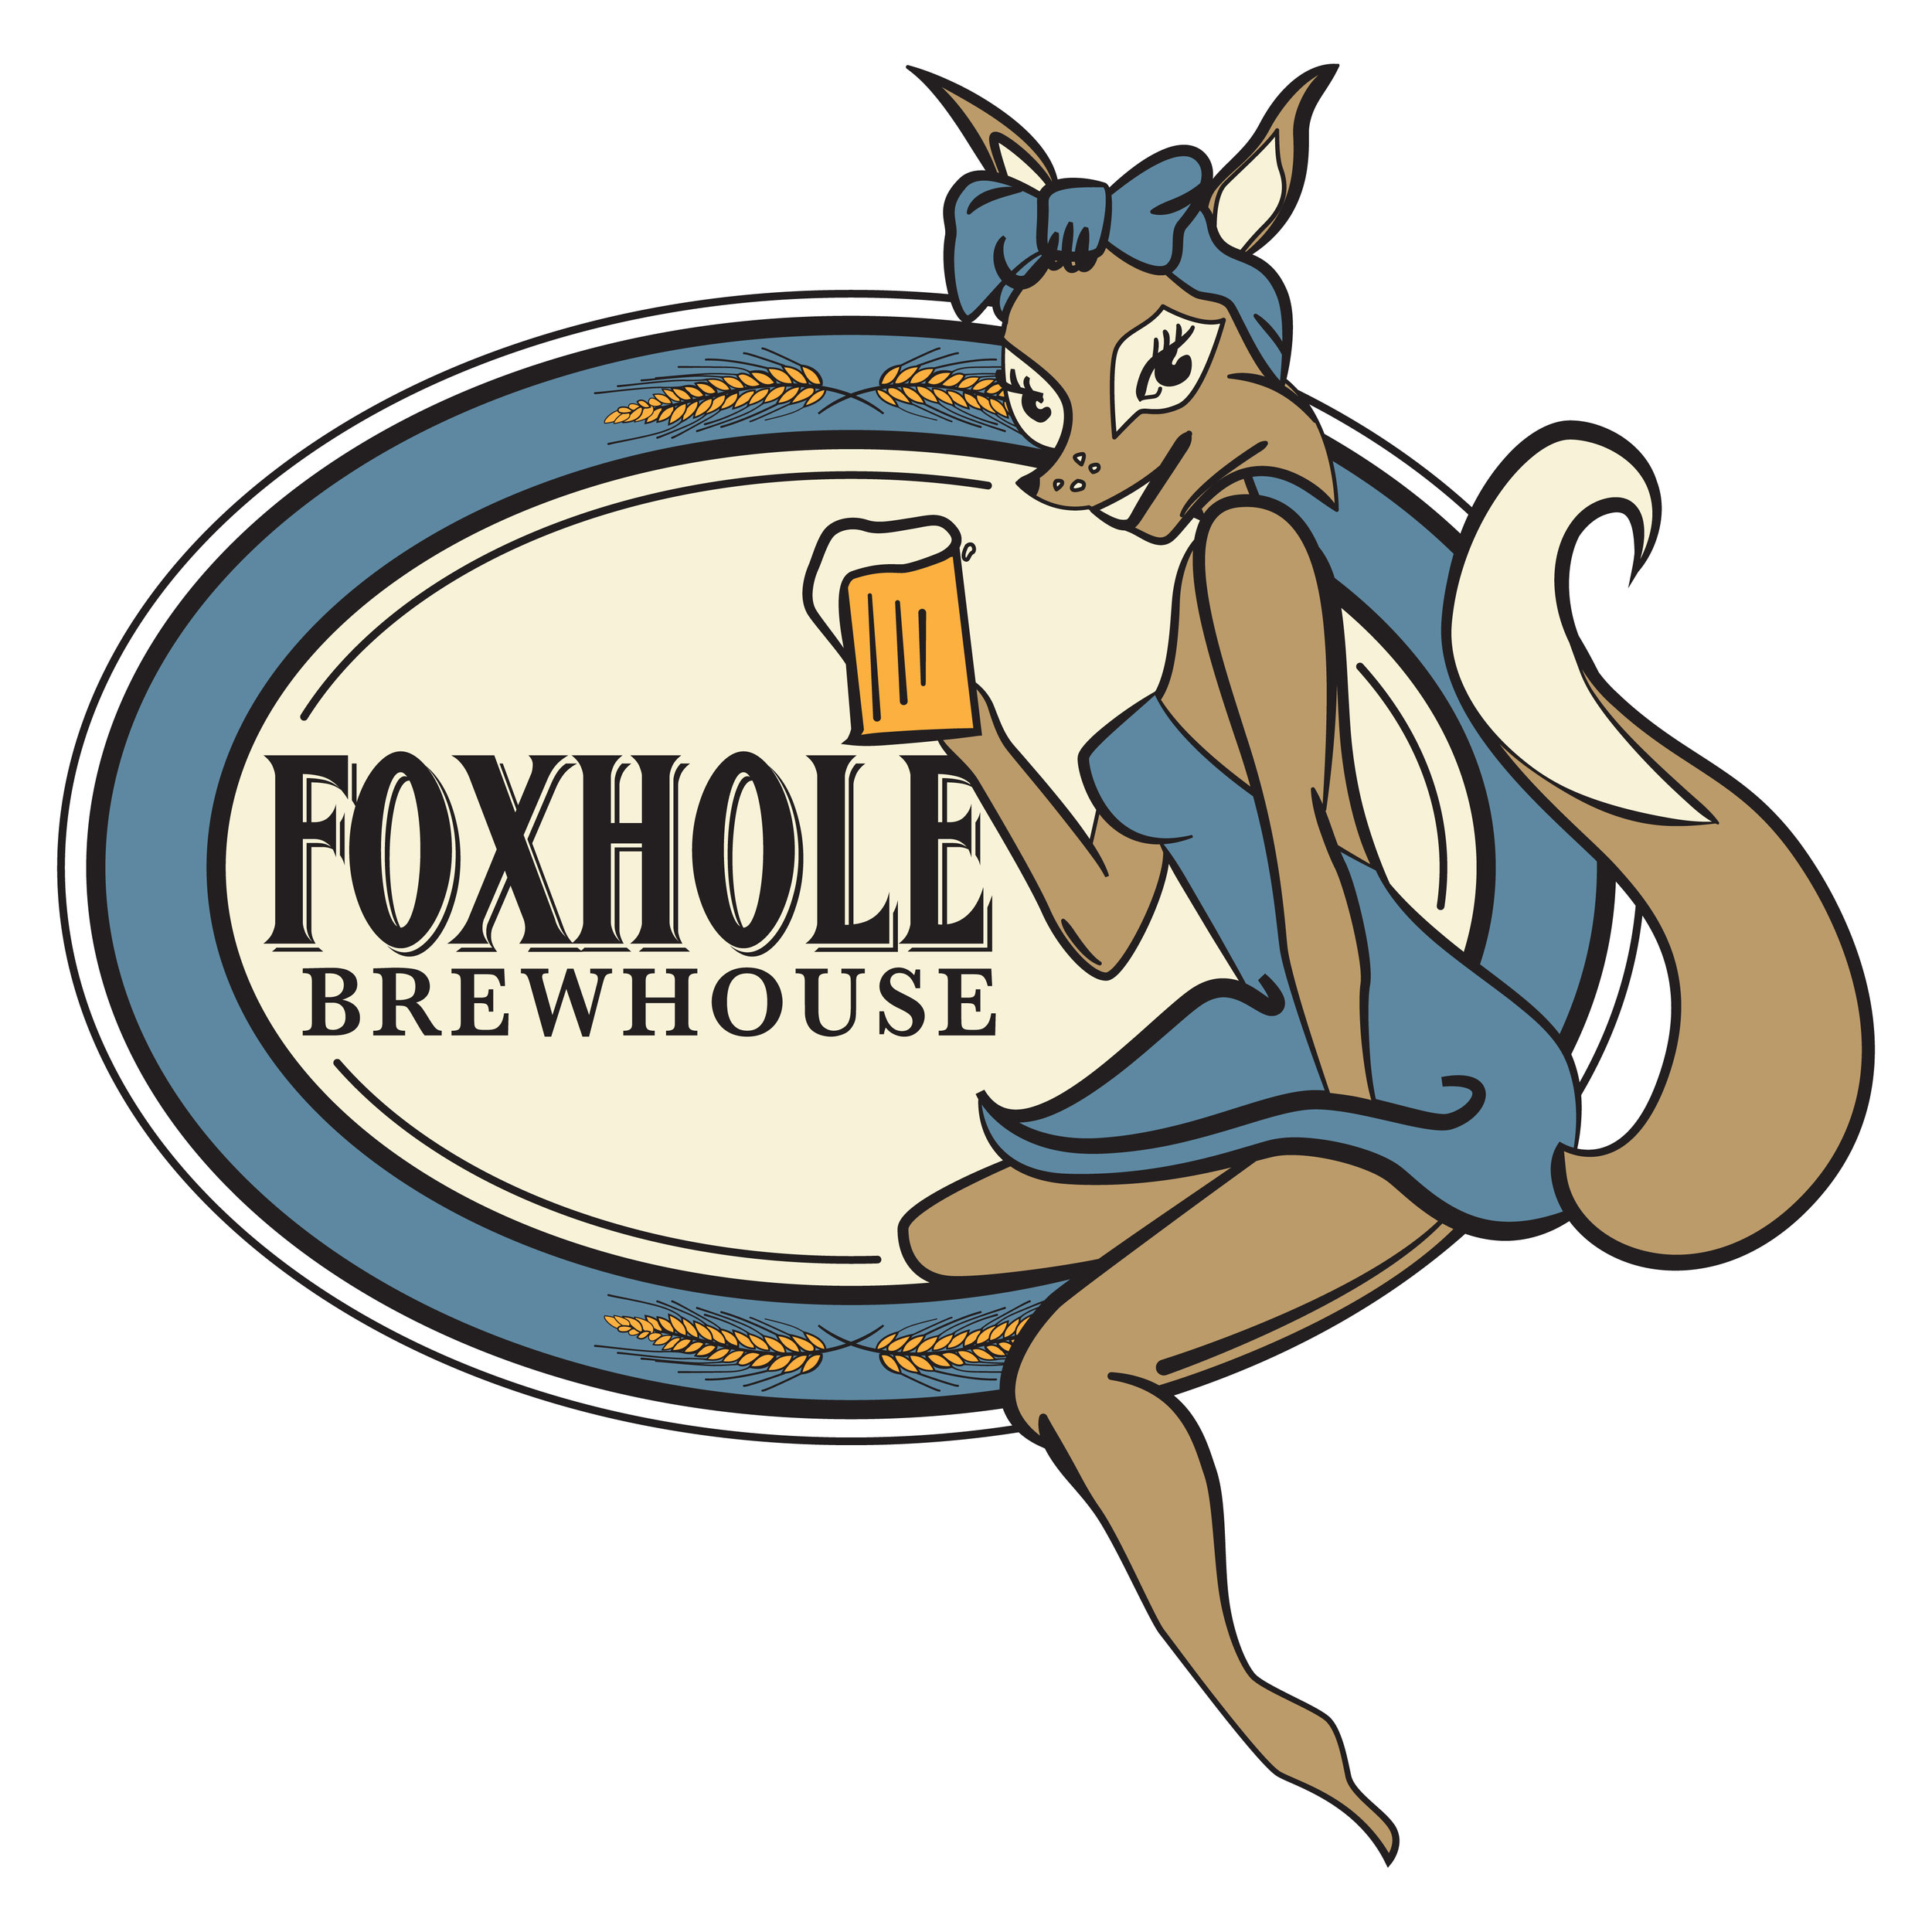 Foxhole-Brewhouse-500dpi.jpg